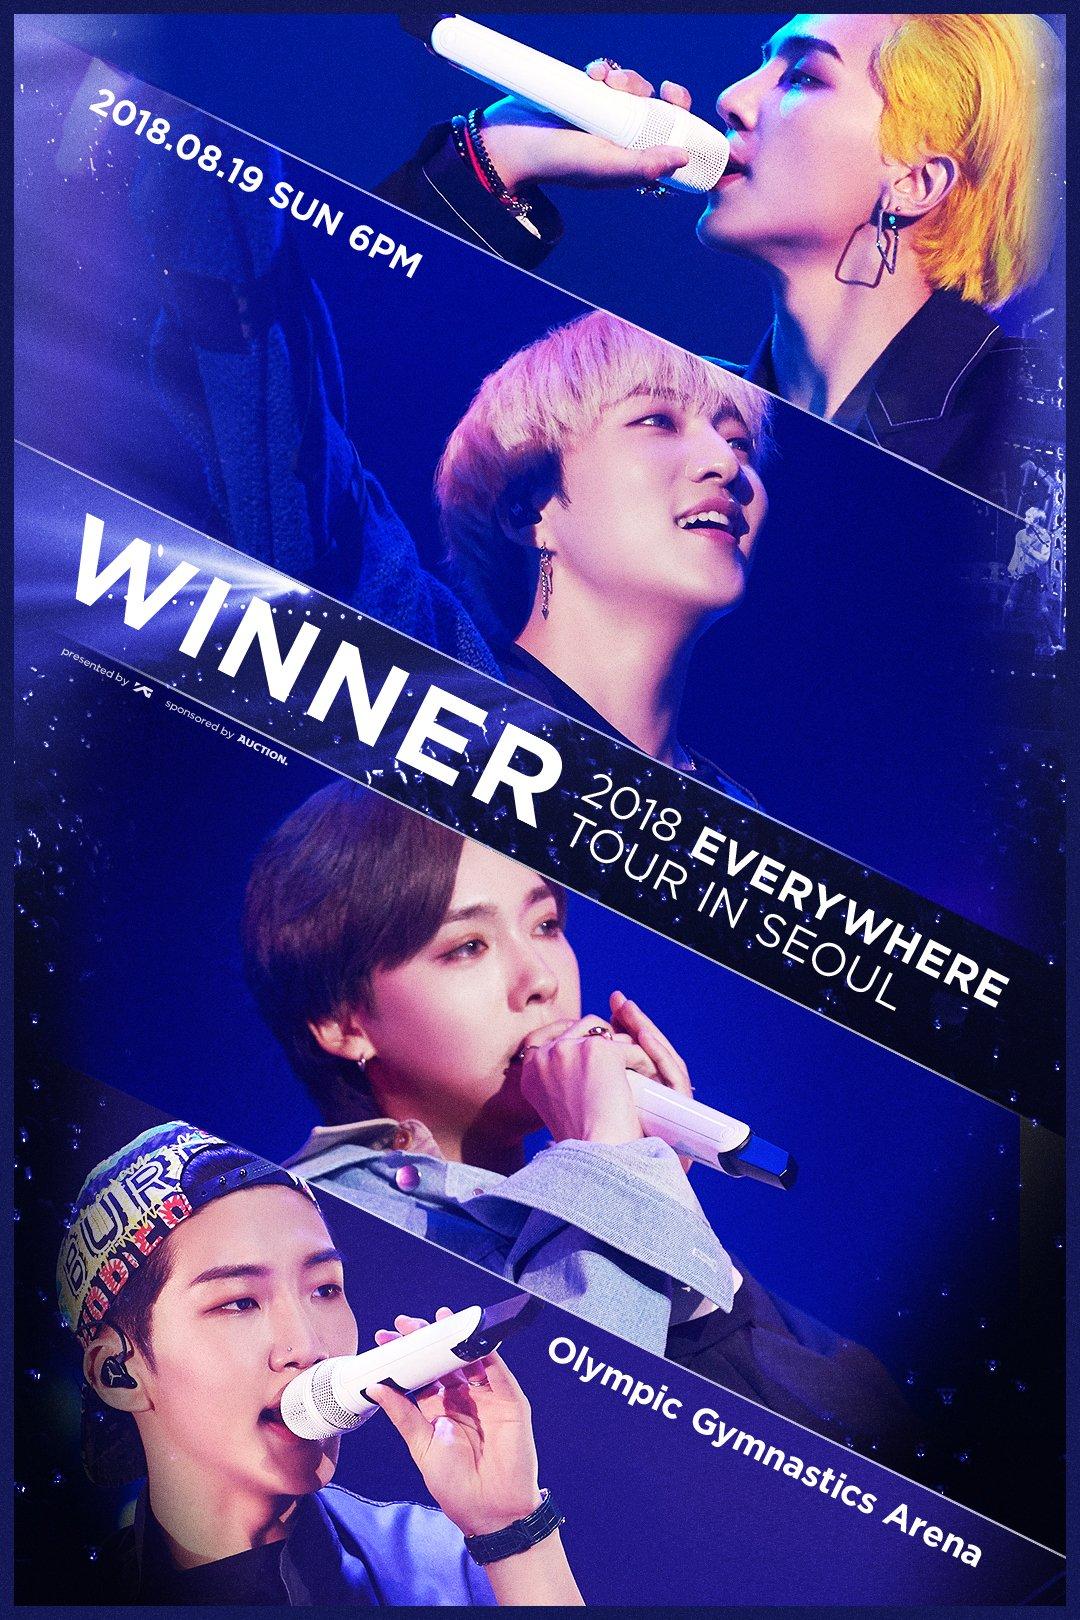 #WINNER 2018 #EVERYWHERE_TOUR  ➡️ https://t.co/x291ZBFgmm https://t.co/OqXMFHJDlS